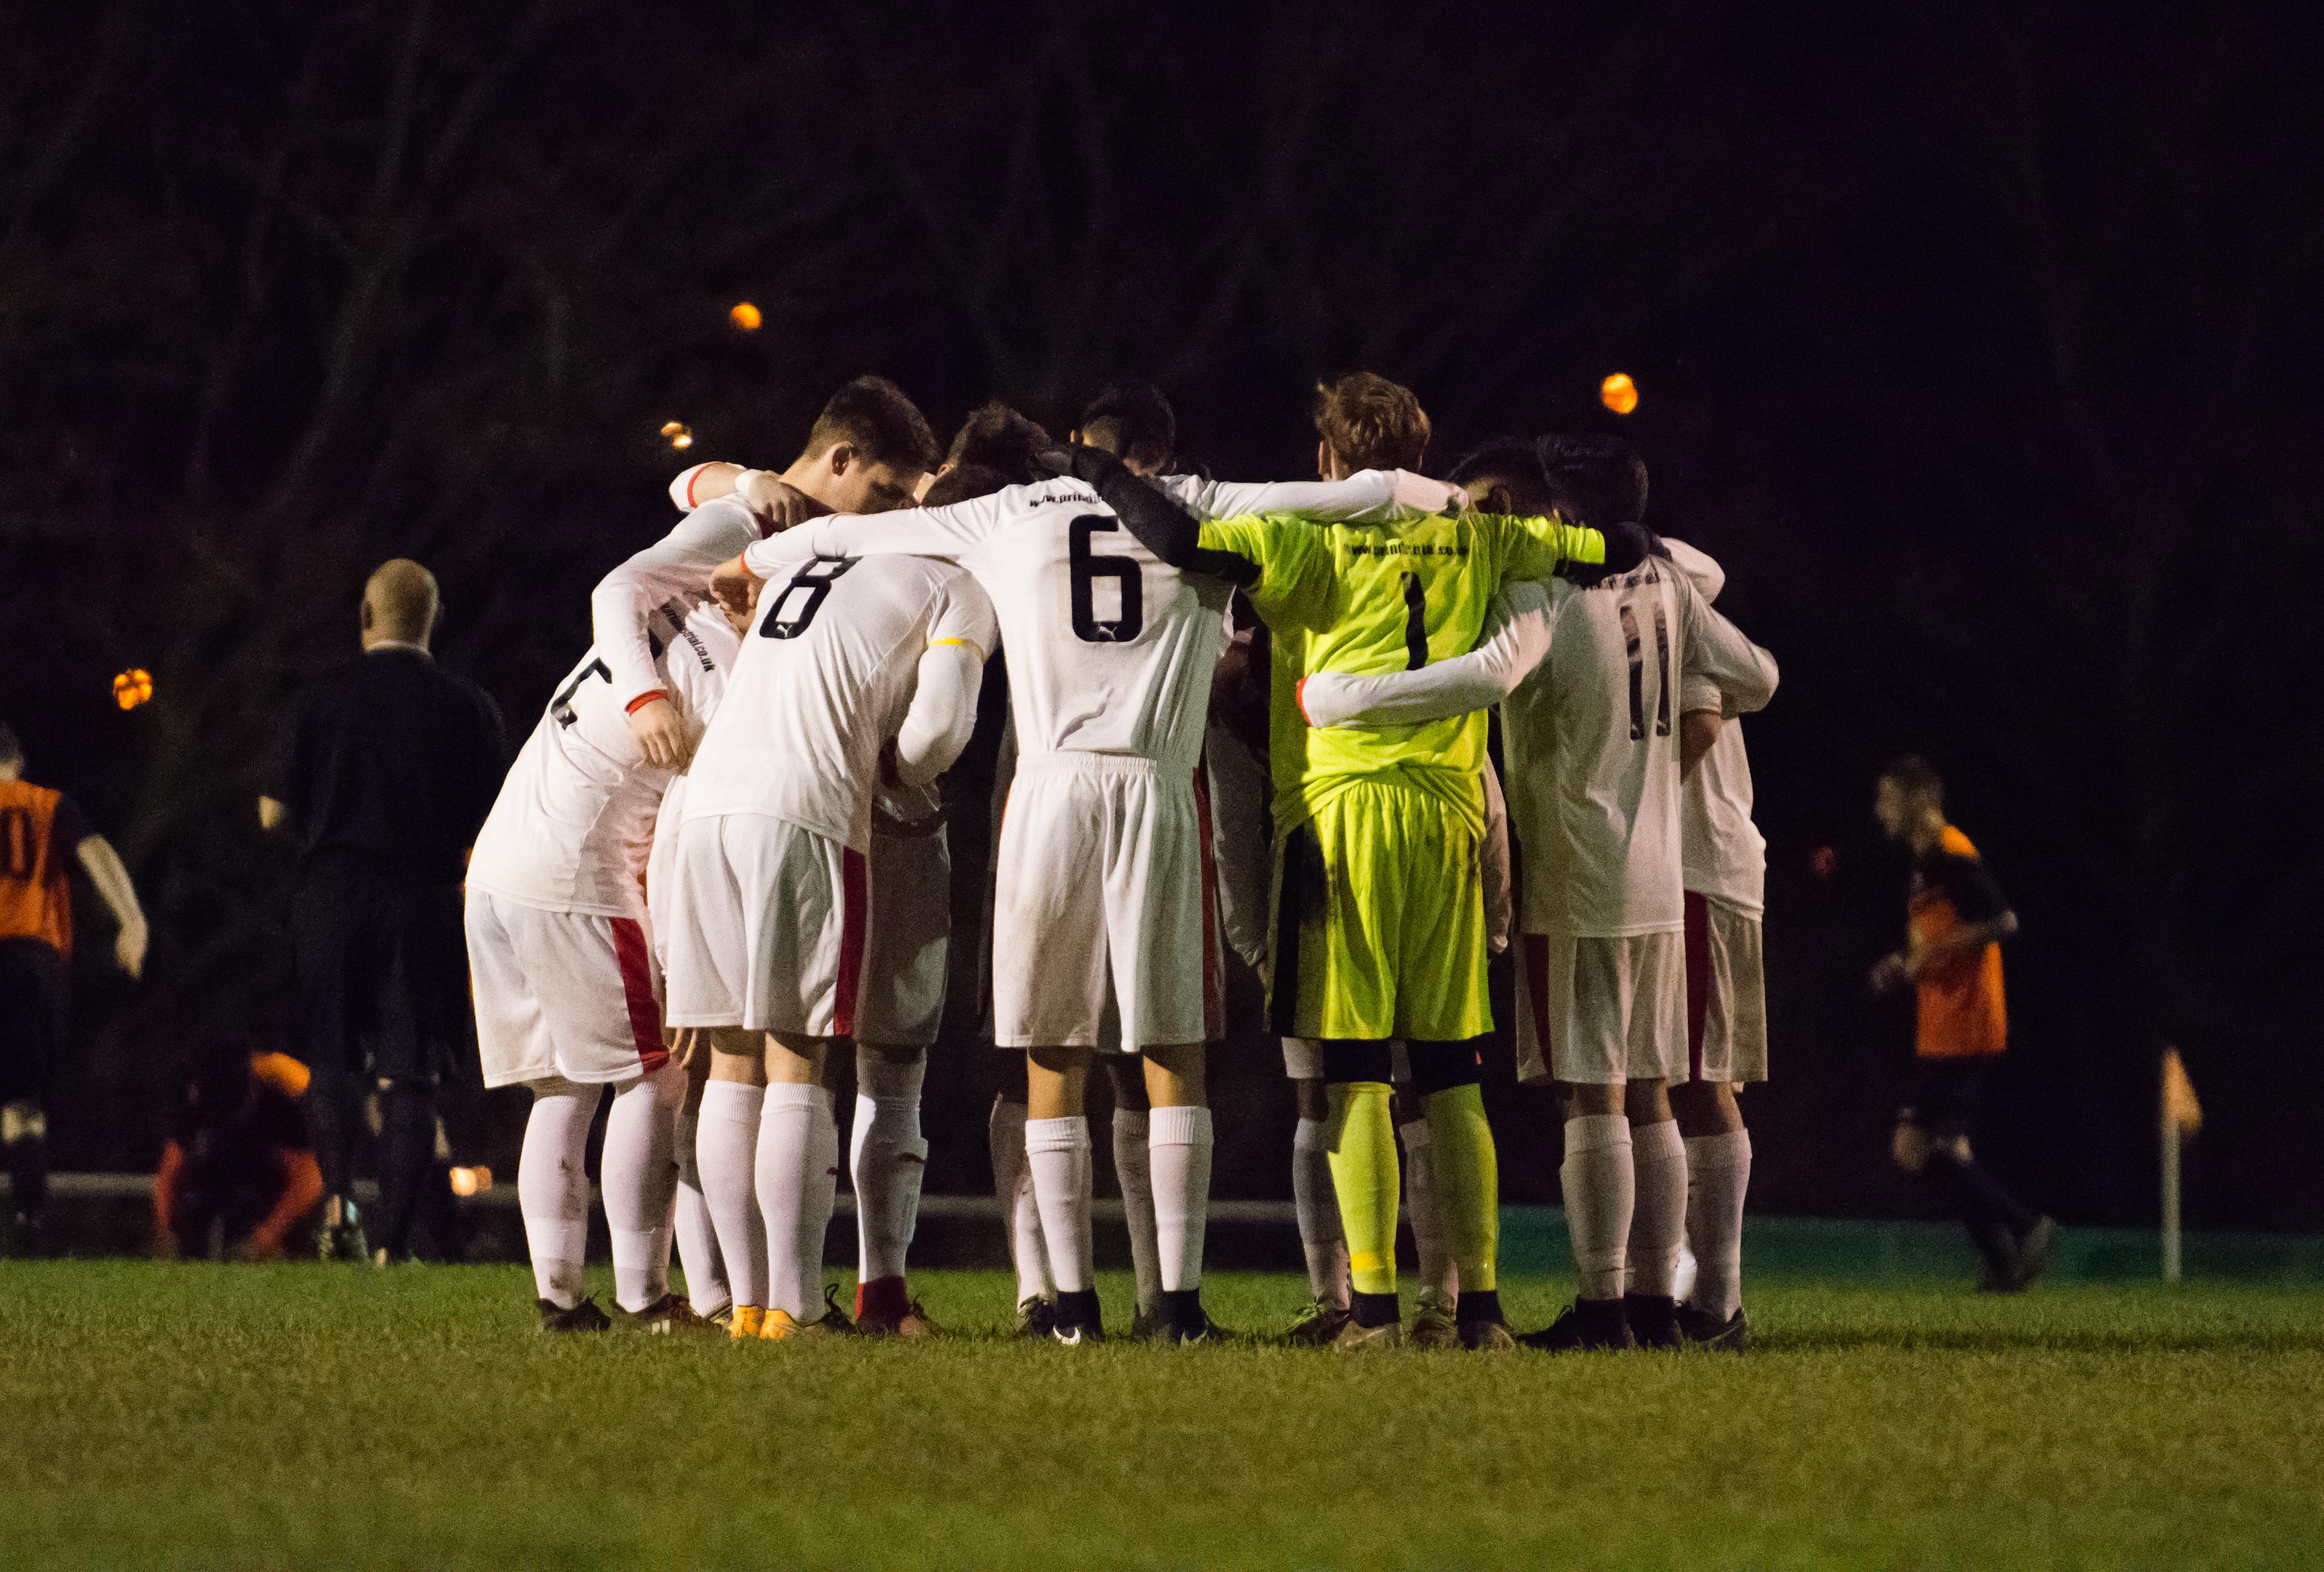 Mile Oak U21s vs Southwick FC U21s 14.12.17 02